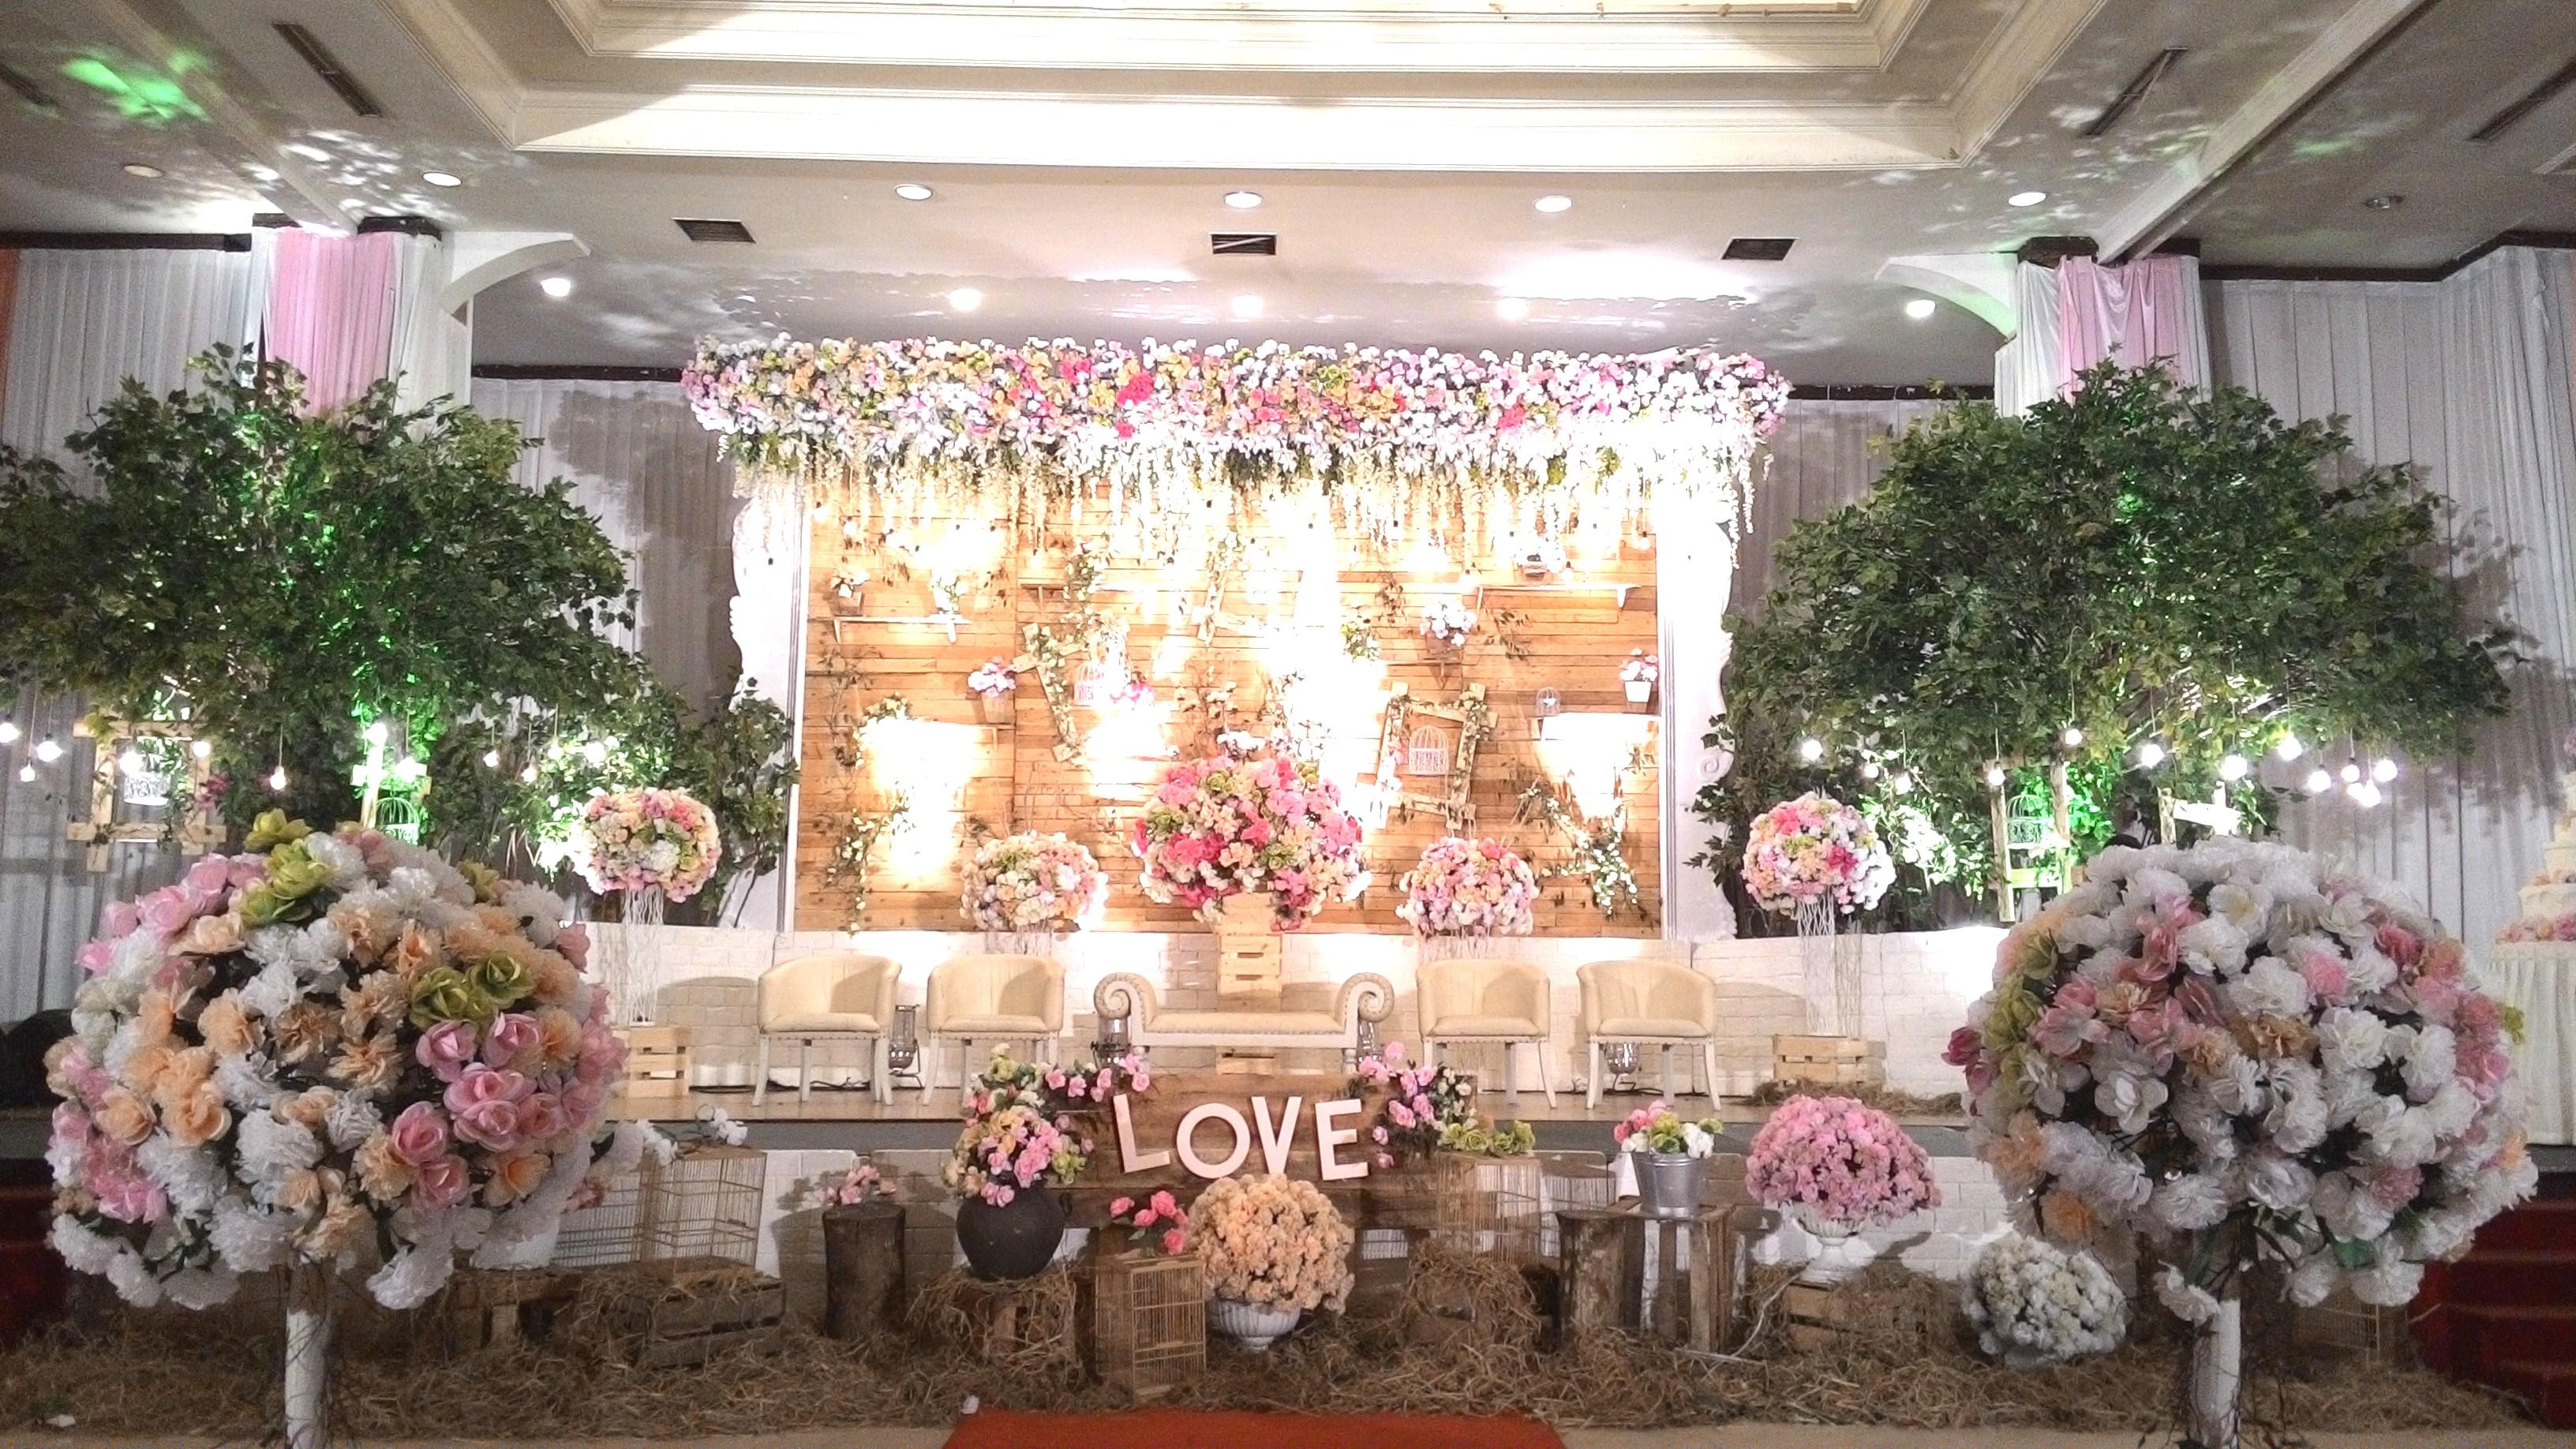 Dbest wedding organizer wedding wedding planning in bandung dbest wedding organizer wedding wedding planning in bandung bridestory junglespirit Gallery